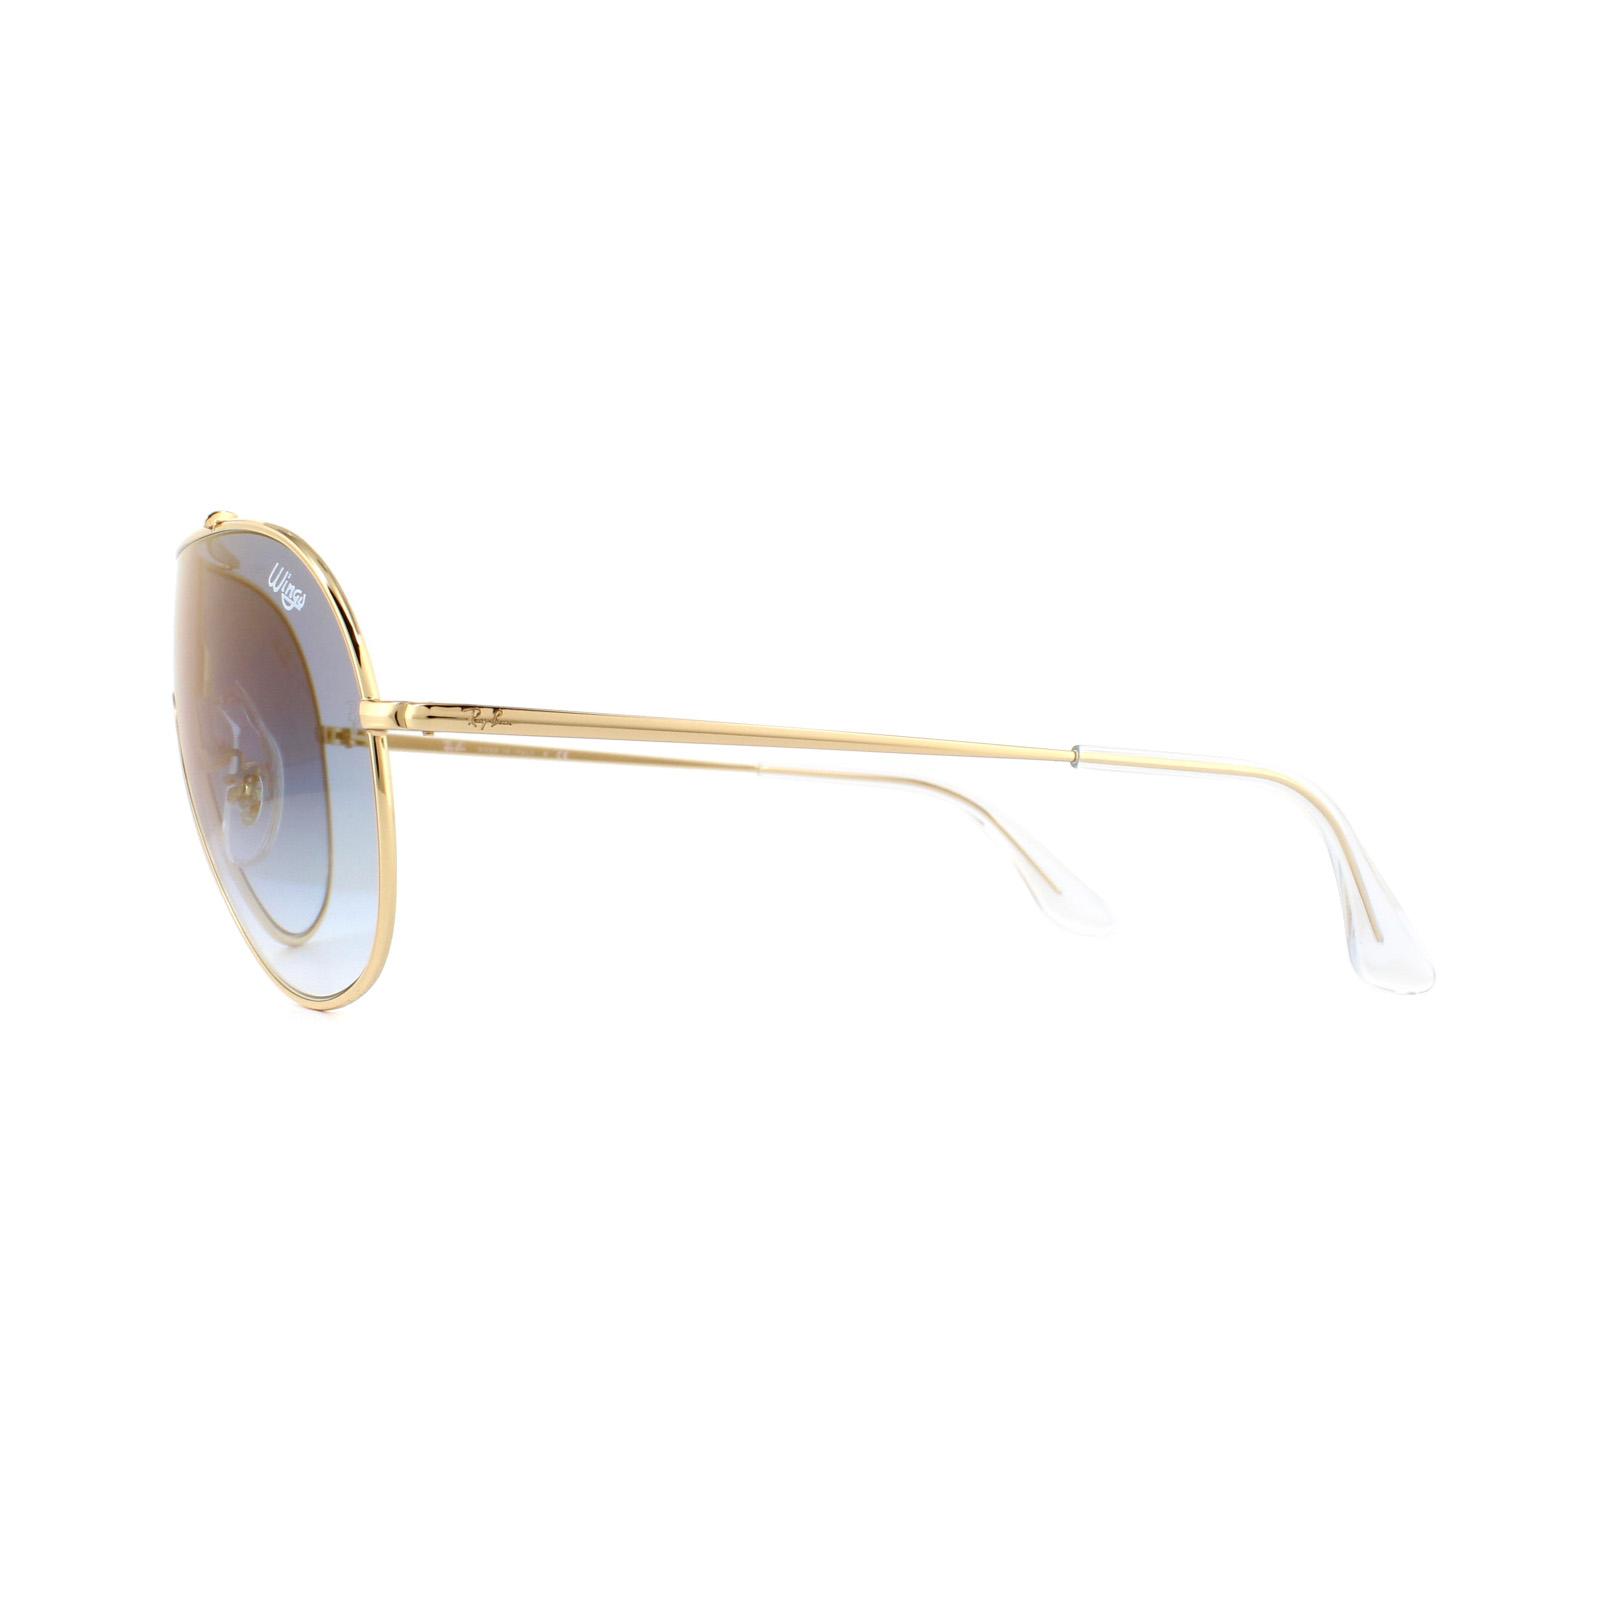 5bb2eebcfc Sentinel Ray-Ban Sunglasses Wings RB3597 001 X0 Gold Blue Gradient Mirror